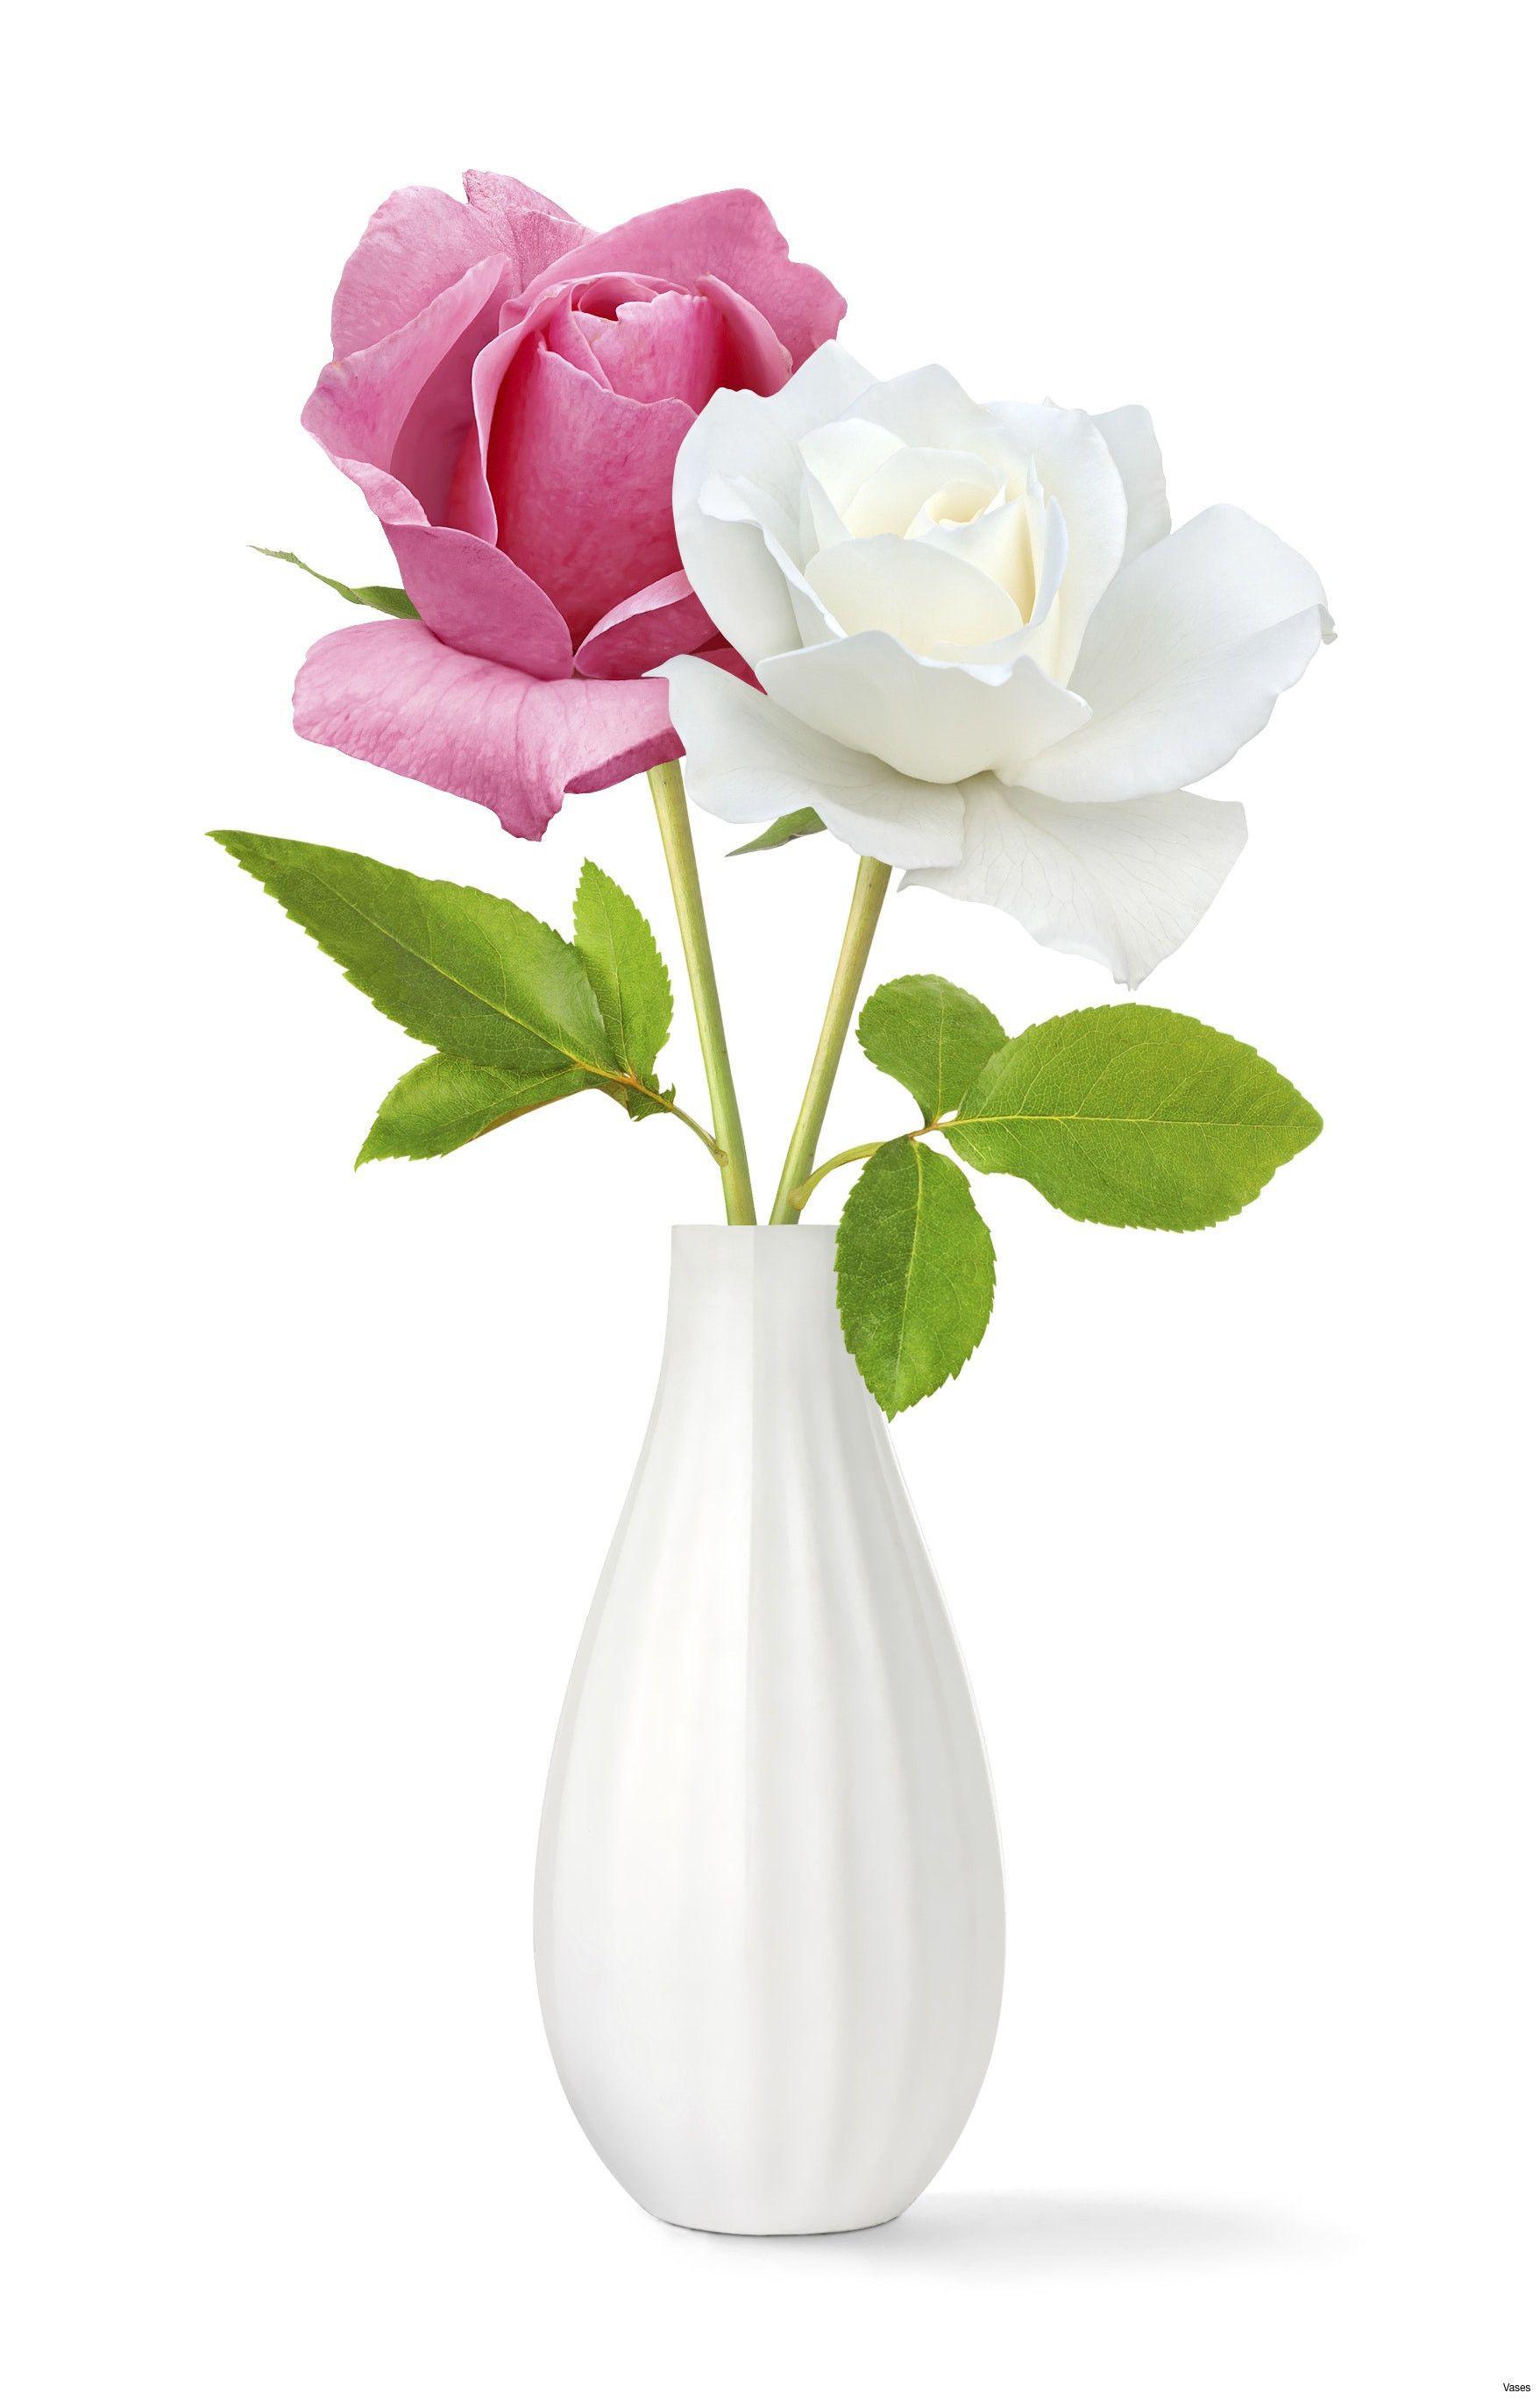 red eiffel tower vases of light pink vase elegant roses red in a vase singleh vases rose intended for light pink vase elegant roses red in a vase singleh vases rose single i 0d scheme